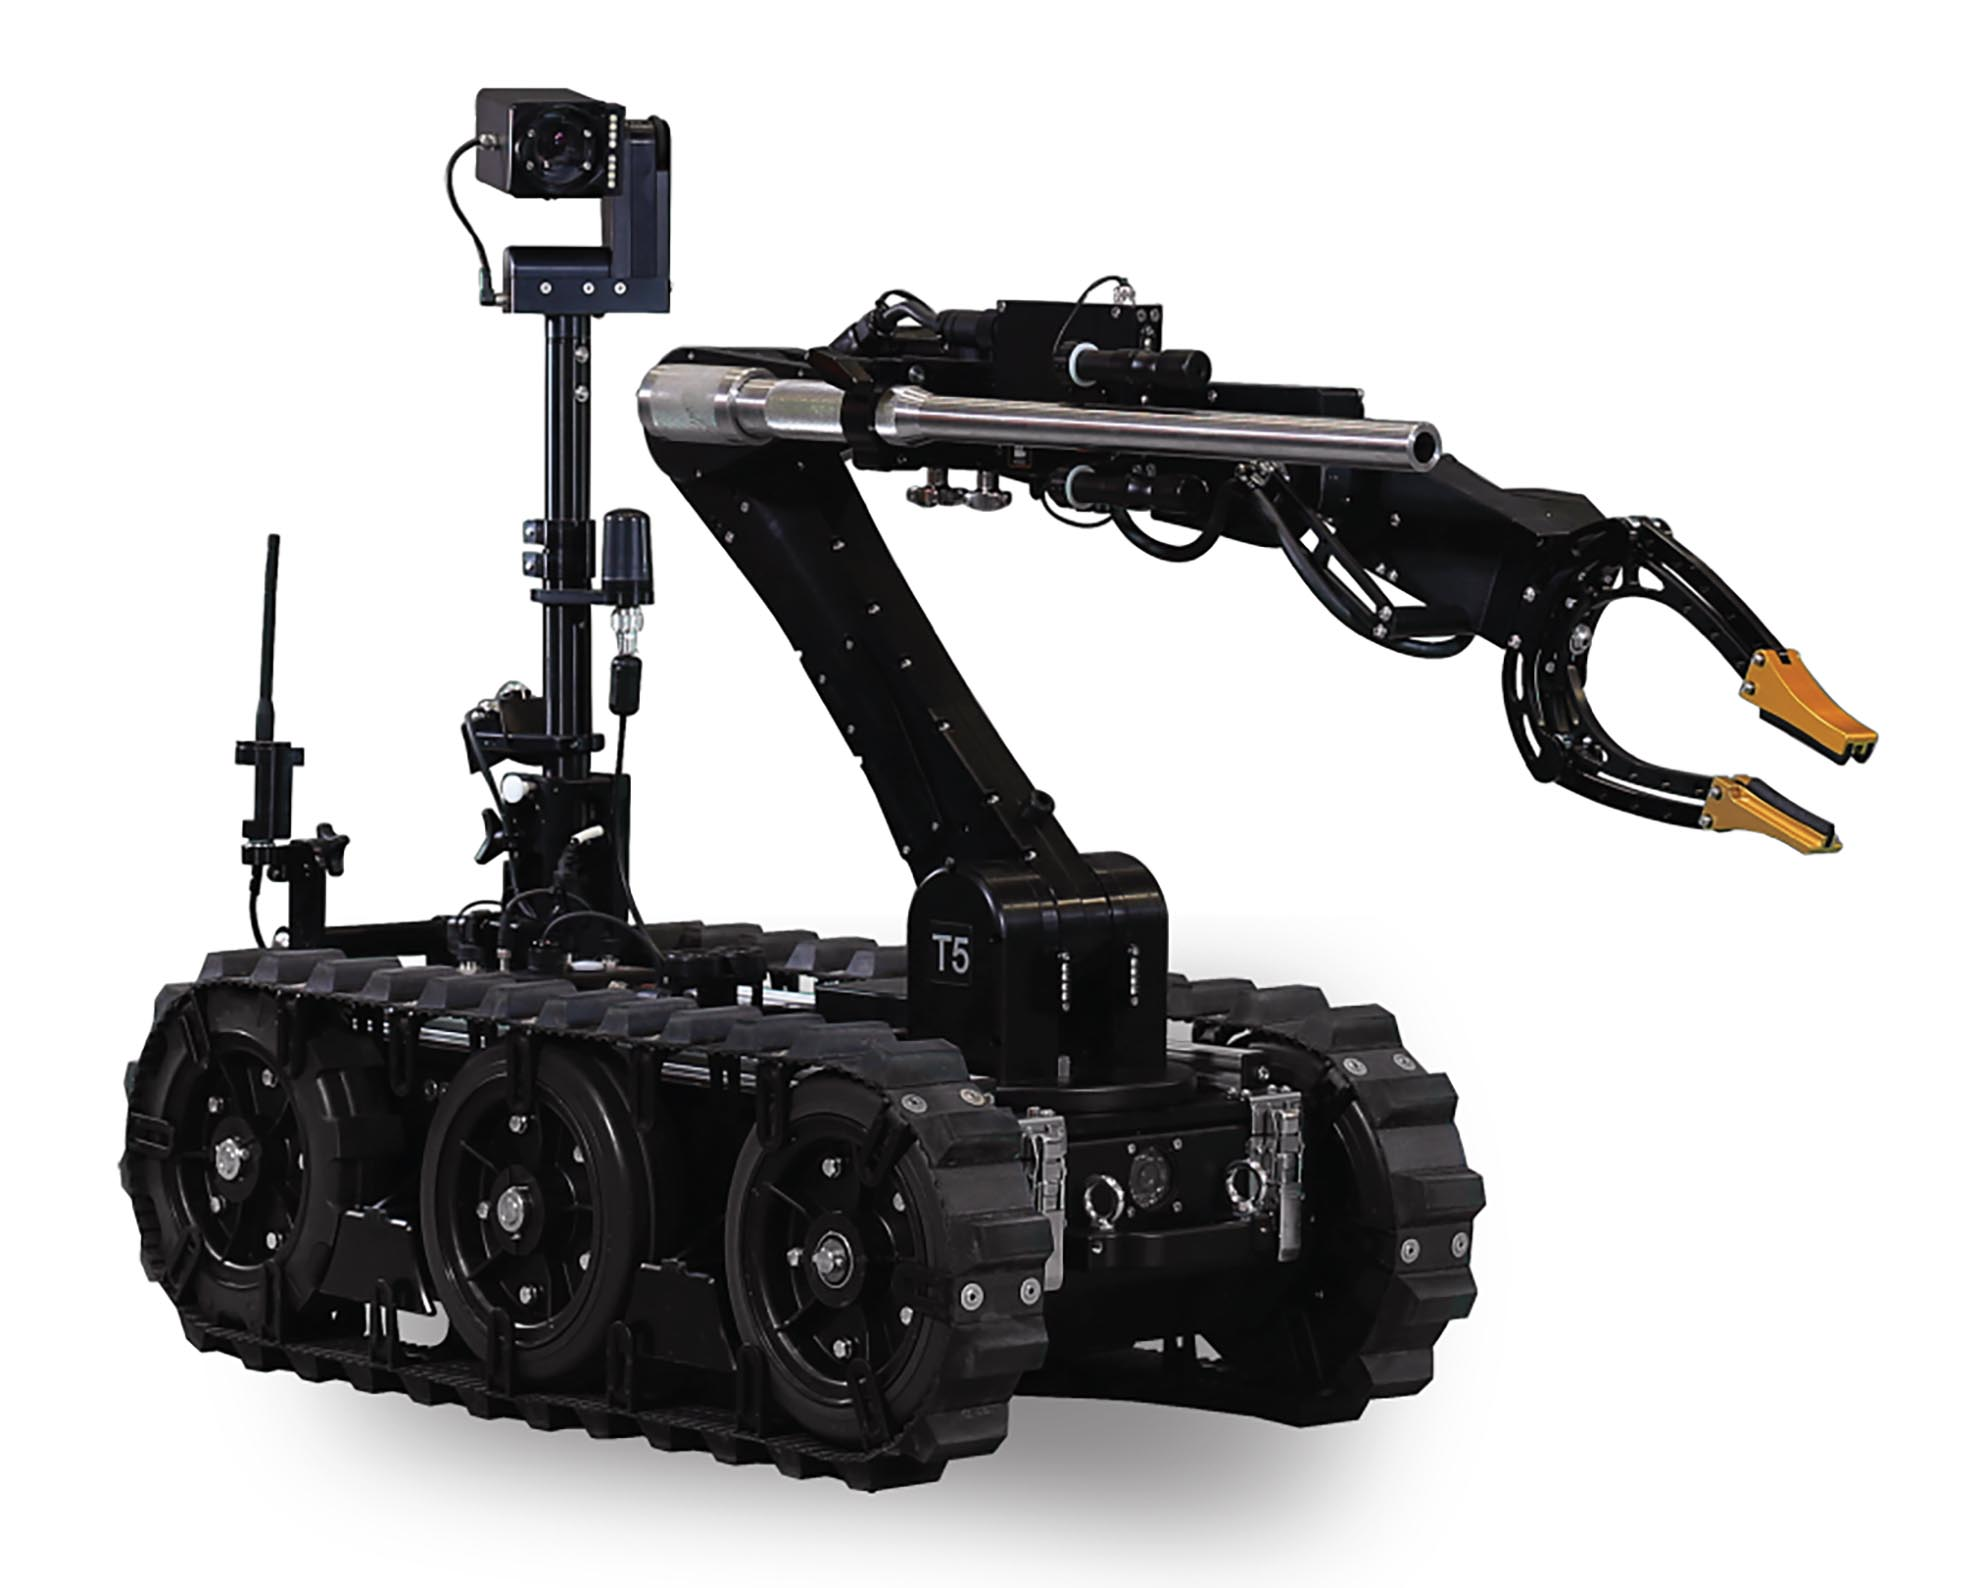 caliber-t5-swat-eod-robot-leveled